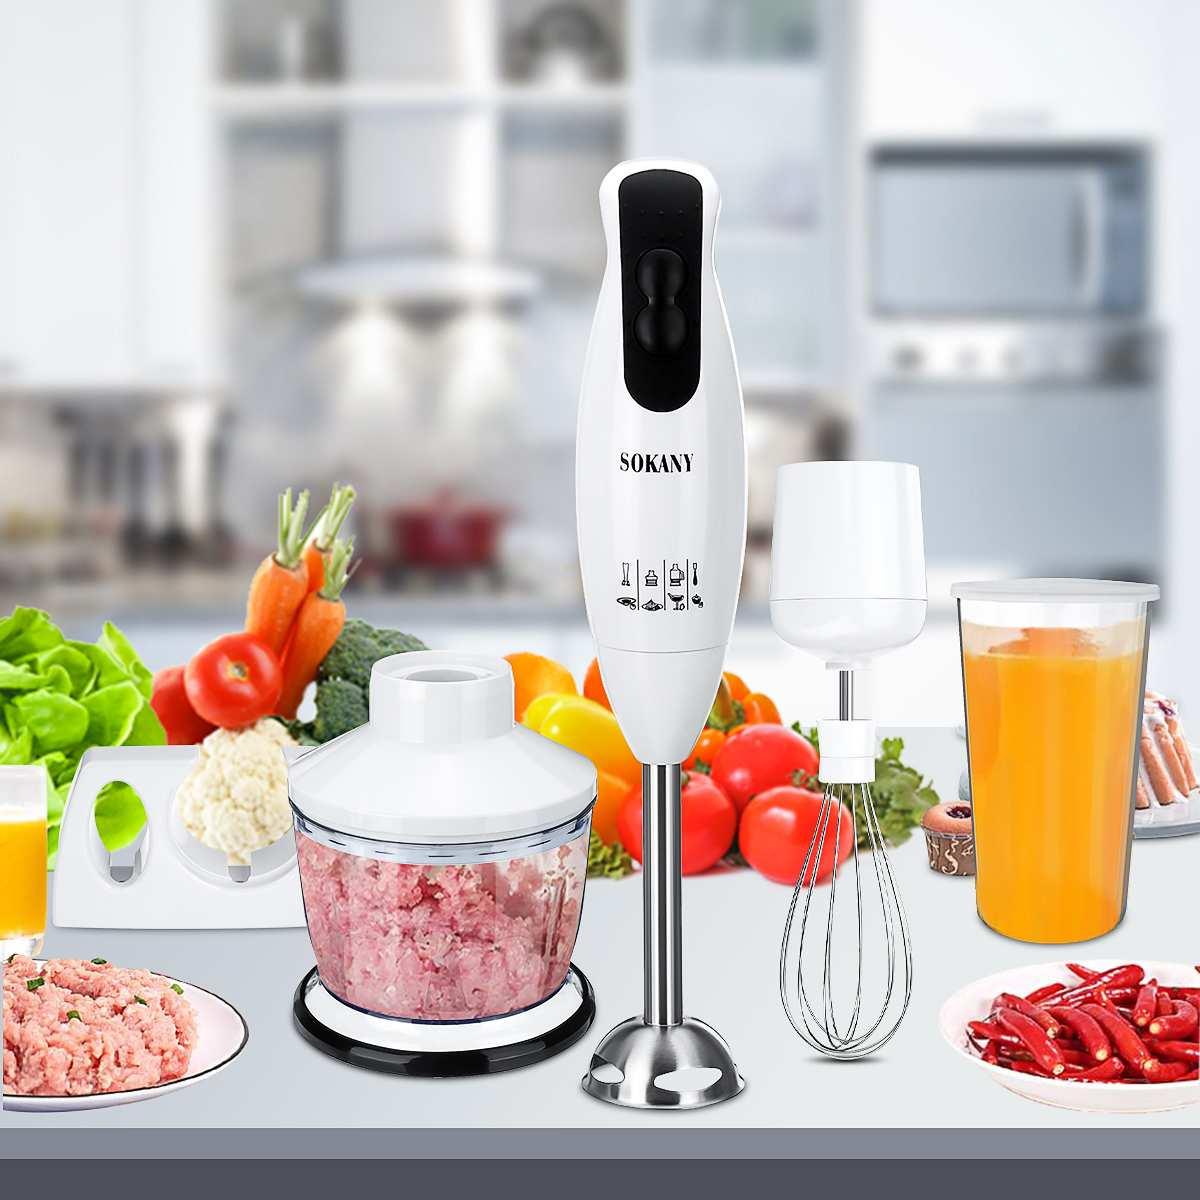 hand mixer chudesnitsa mp 3502 4 in 1 Hand Blender Electric Food Blender Mixer 2Speed Detachable Hand Food supplement Vegetable Meat Grinder Whisk Juicer Mixer